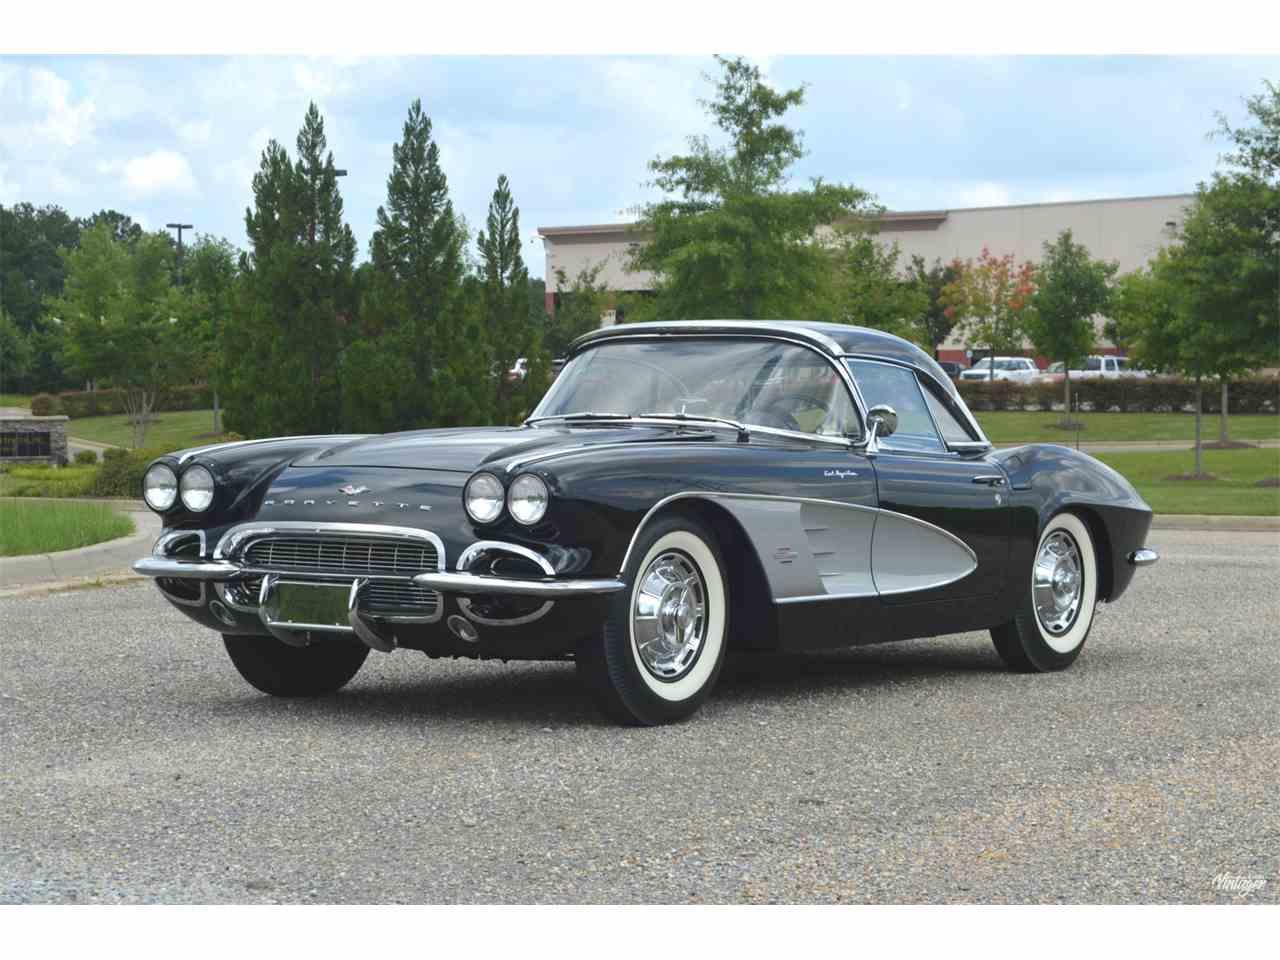 1961 chevrolet corvette for sale cc 1003380. Black Bedroom Furniture Sets. Home Design Ideas